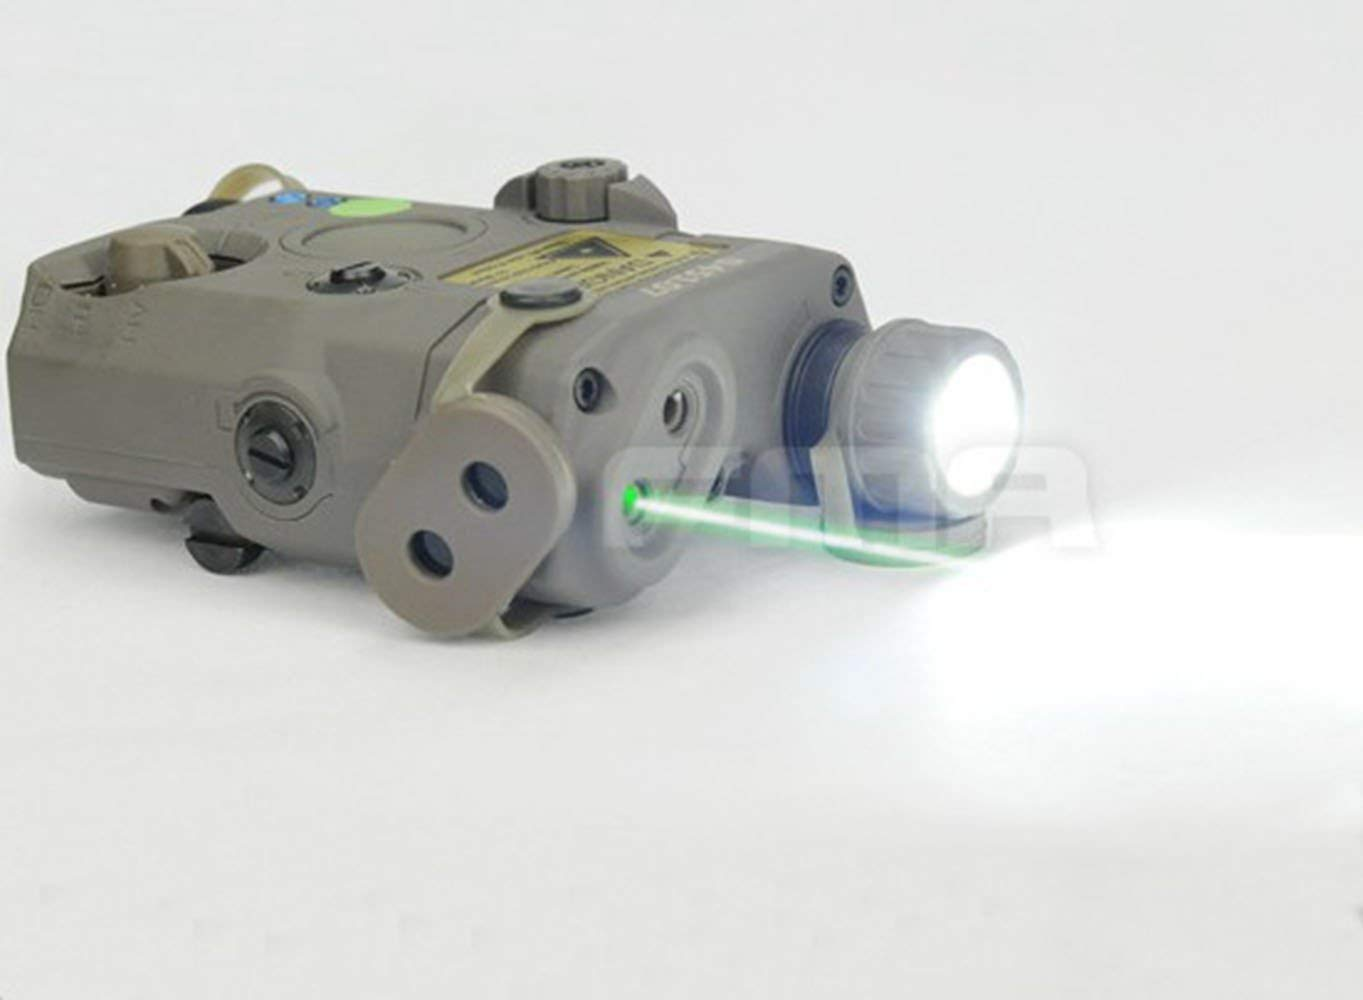 H World Shopping Airsoft Version PEQ LA5 Upgrade Version LED White Flashlight + Grn laser w/ IR AEG GBB CQB FG